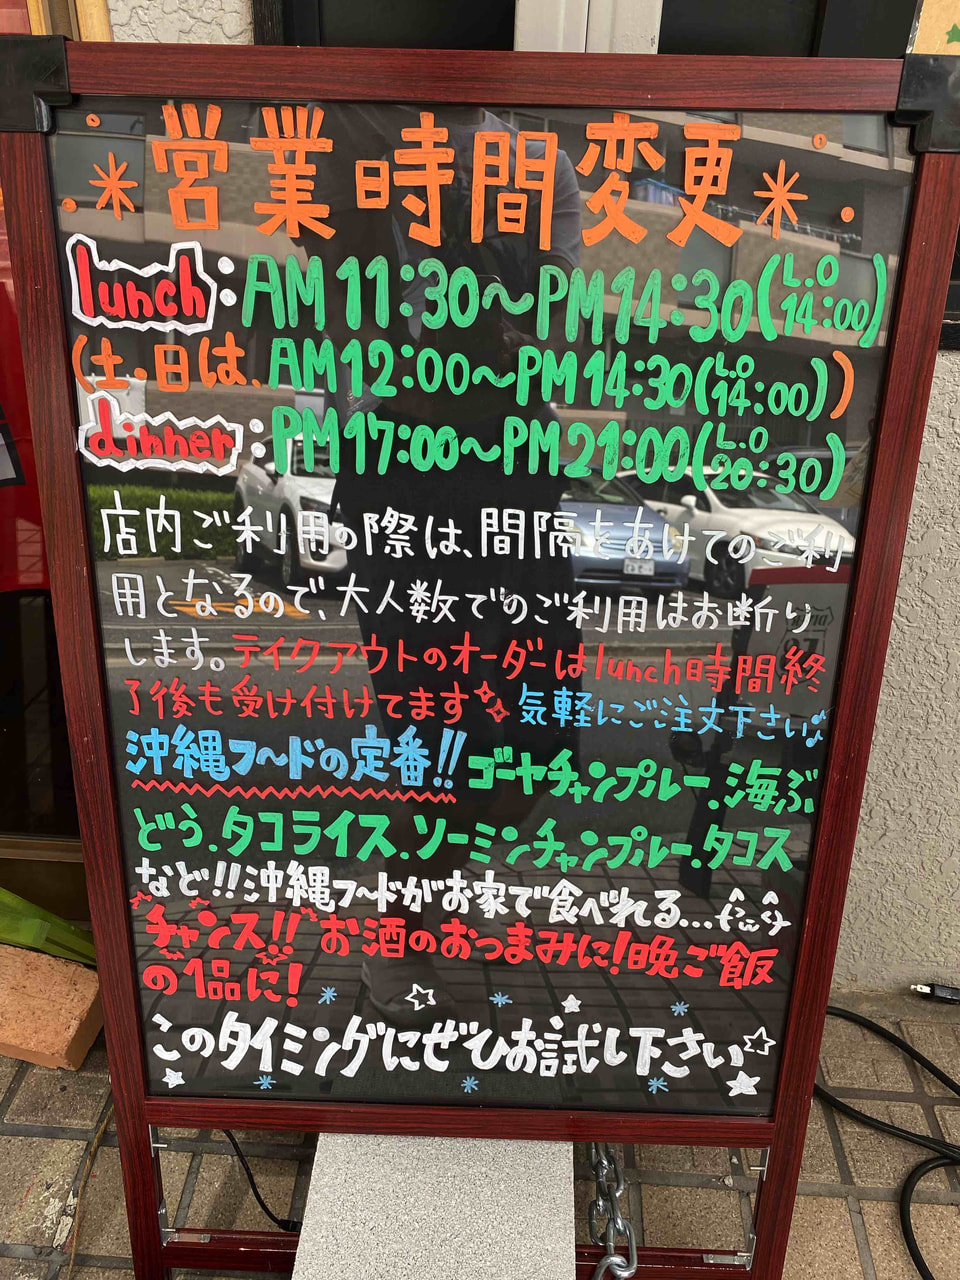 DINER58(ダイナーゴッパチ)(朝霞市)のテイクアウトメニュー